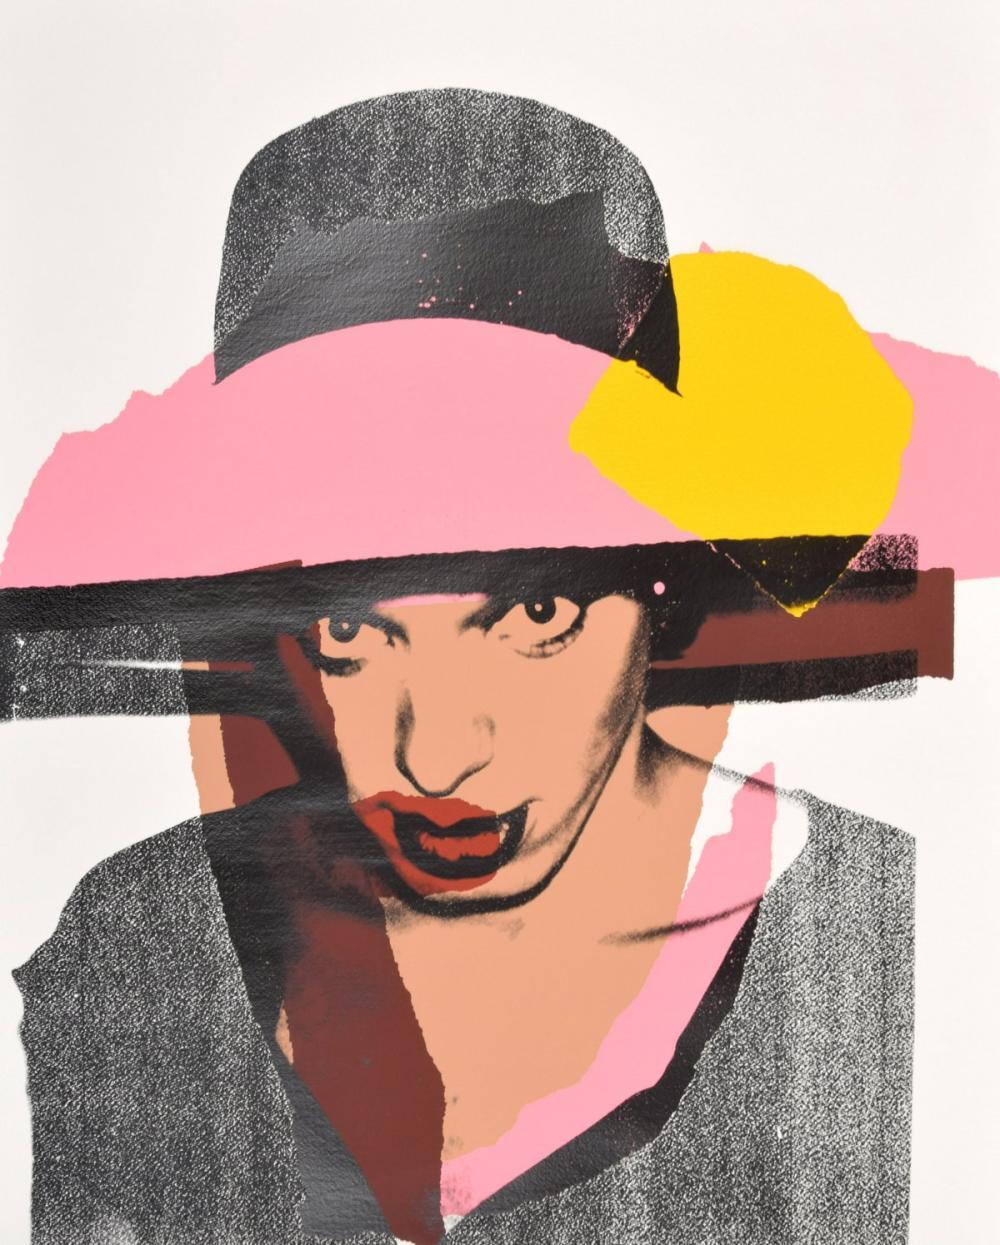 Andy Warhol LADIES & GENTLEMEN Screenprint, Signed Edition